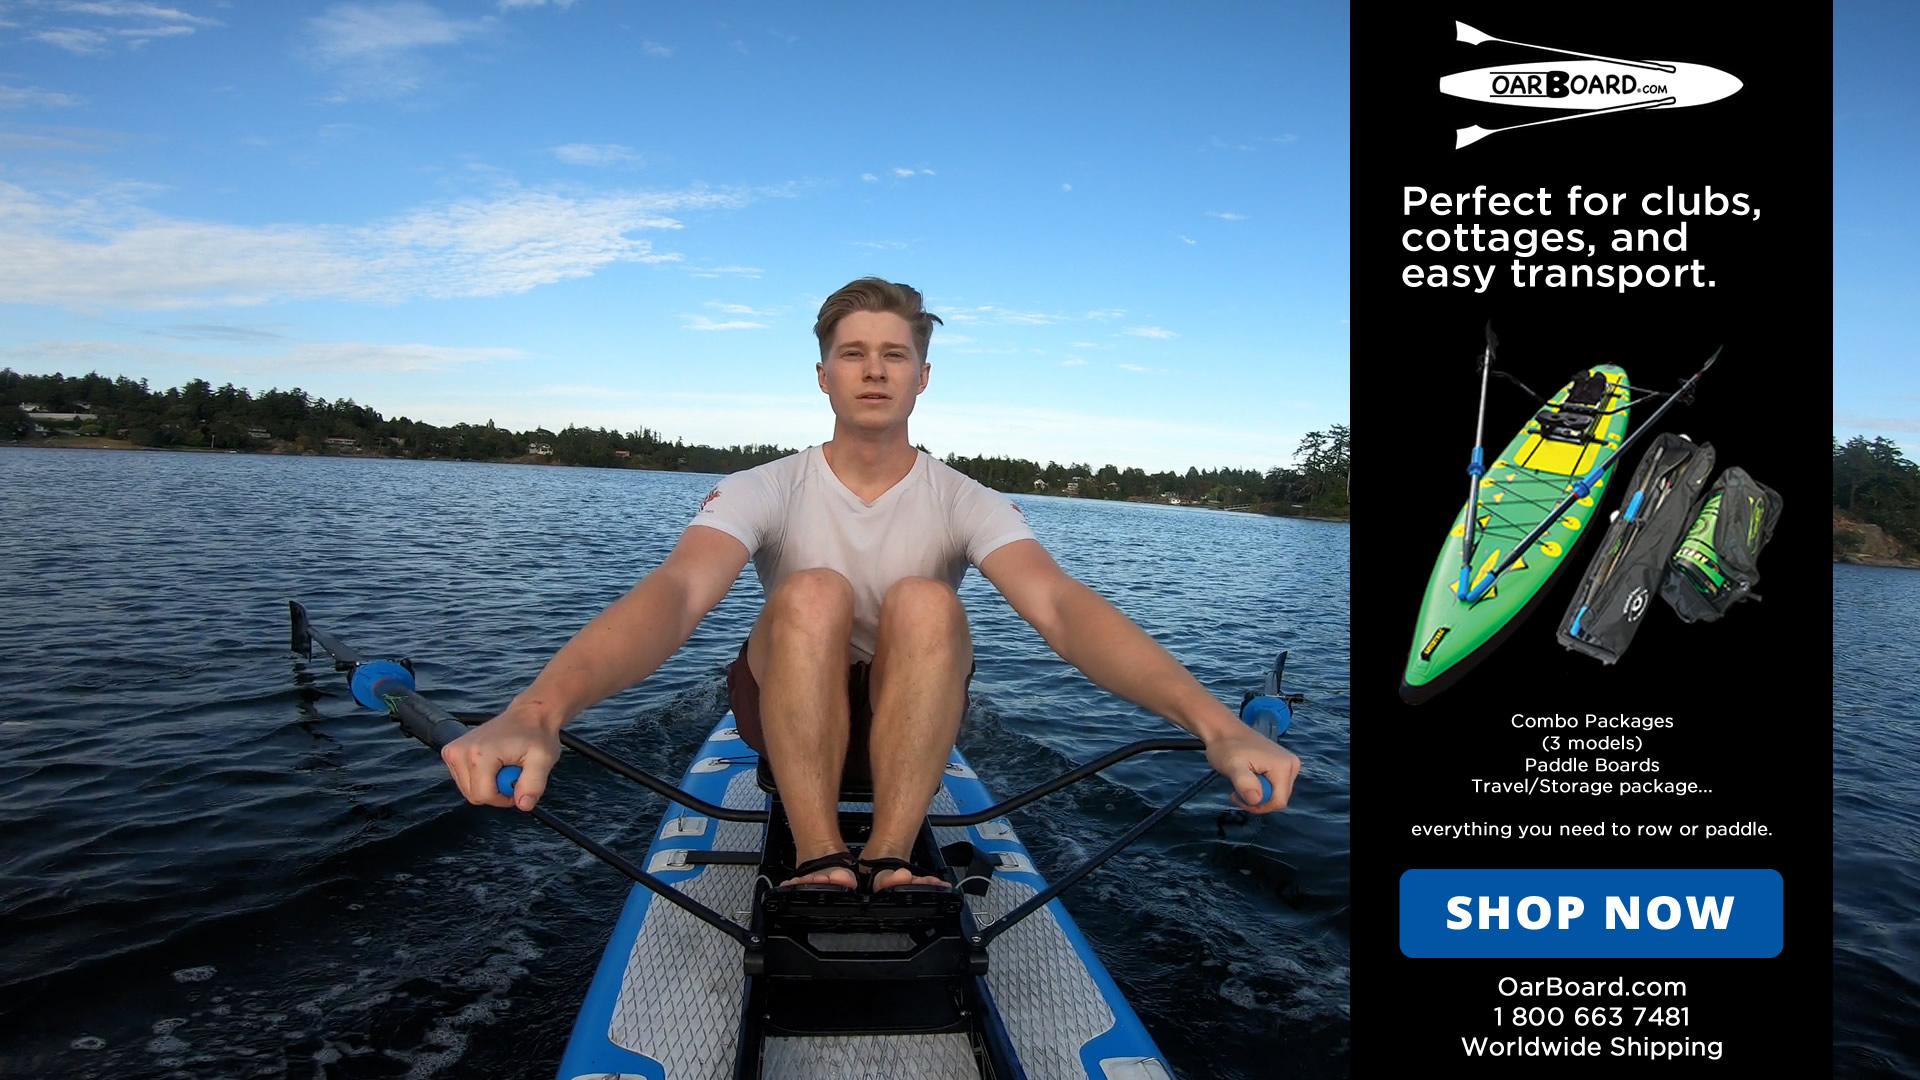 Oar-Board-Stand-Up-Paddle-Board-Rowing-News-2021-1920